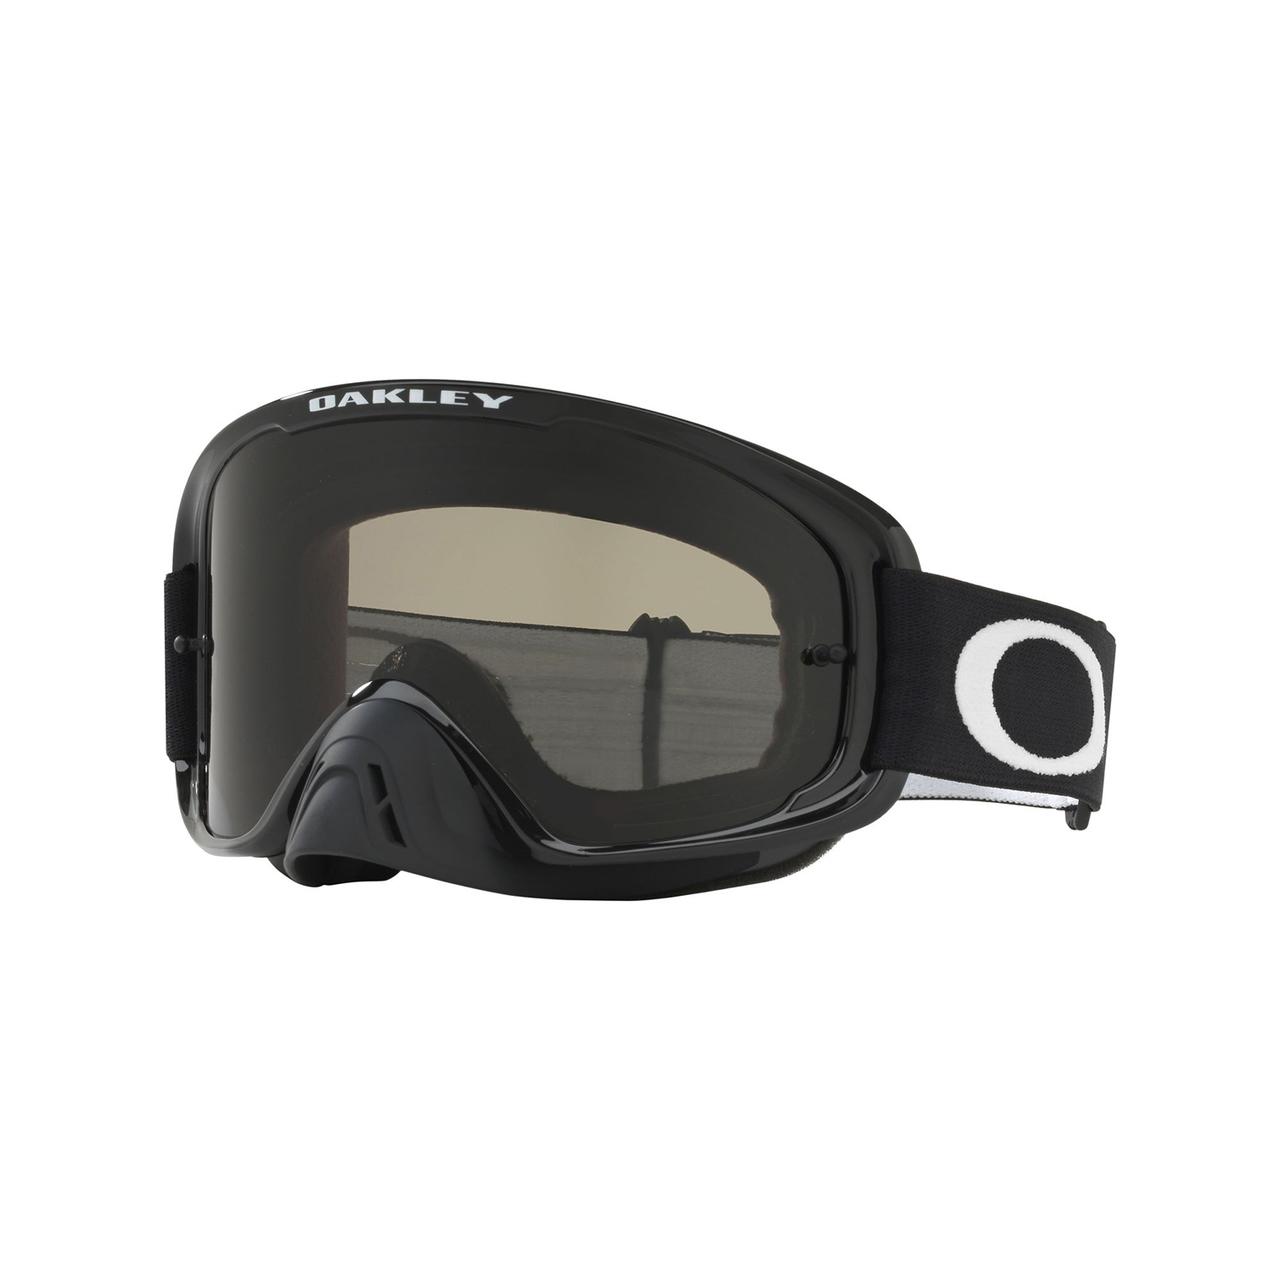 e82d90a704e Oakley 2018 O Frame 2.0 Sand MX Goggle Adult (Jet Black) Dark Grey ...